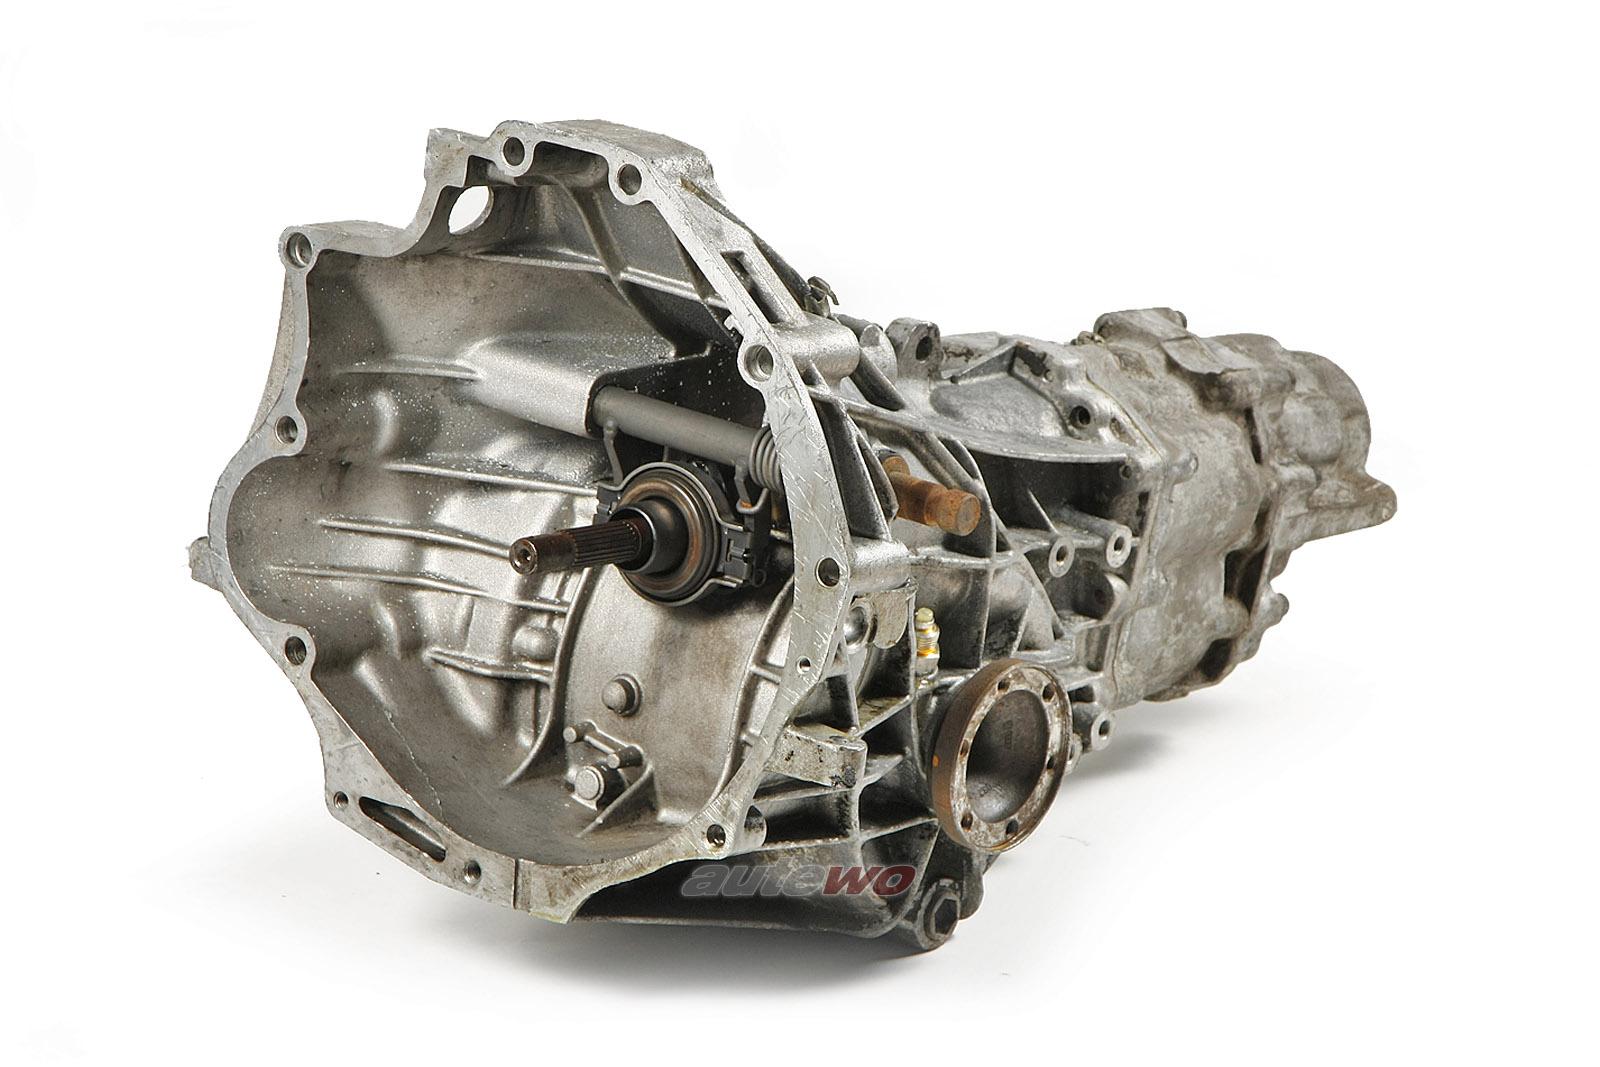 093300041AX Audi/VW 80/Coupe Typ 81 1.9l 5-Gang-Getriebe VW 11120 auch für 2V